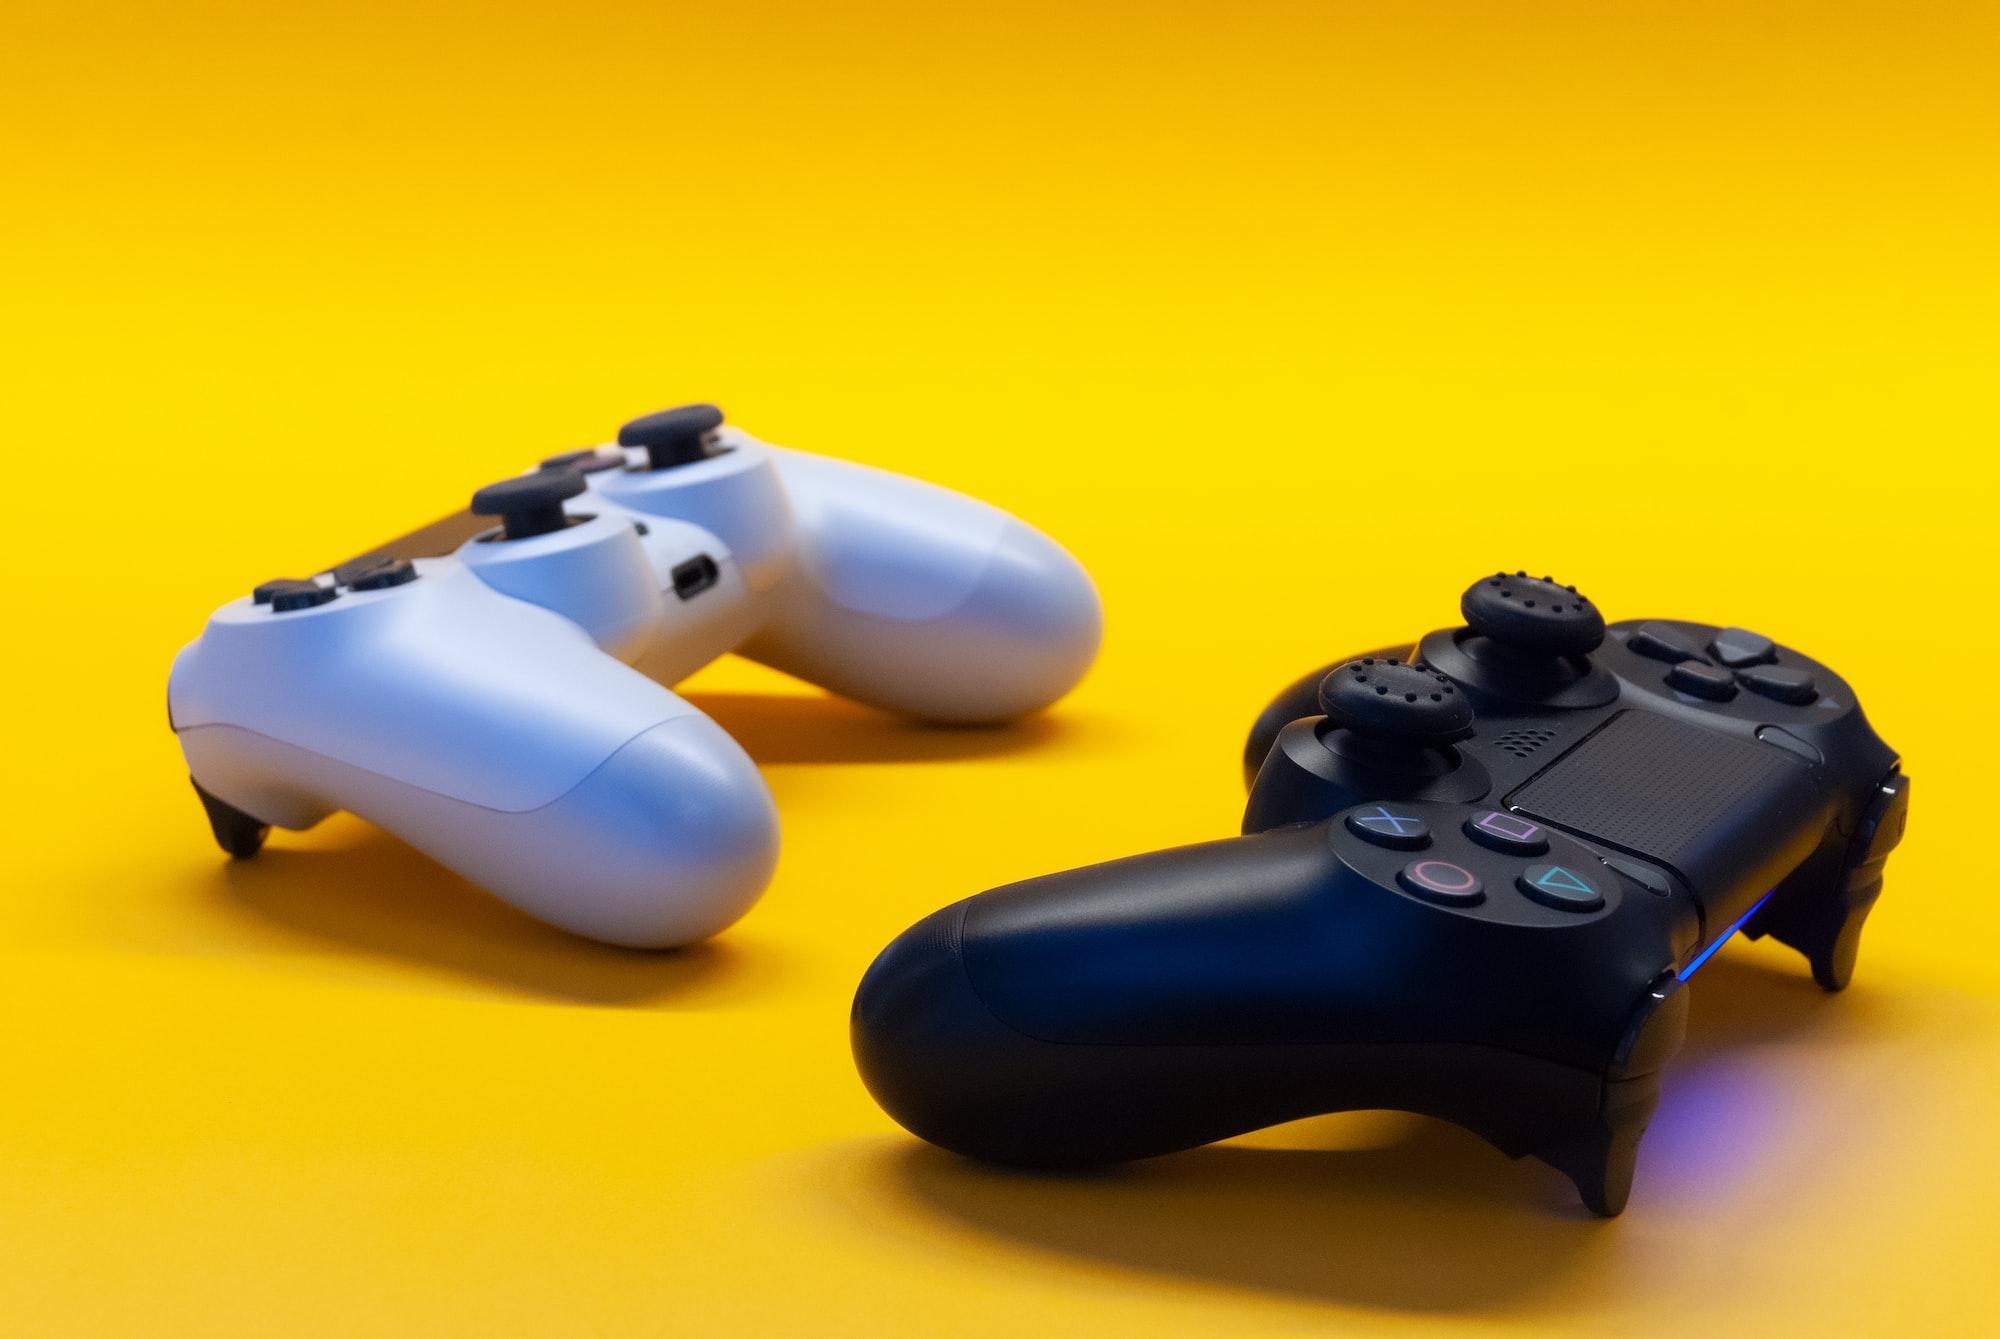 Hvorfor investere i gaming